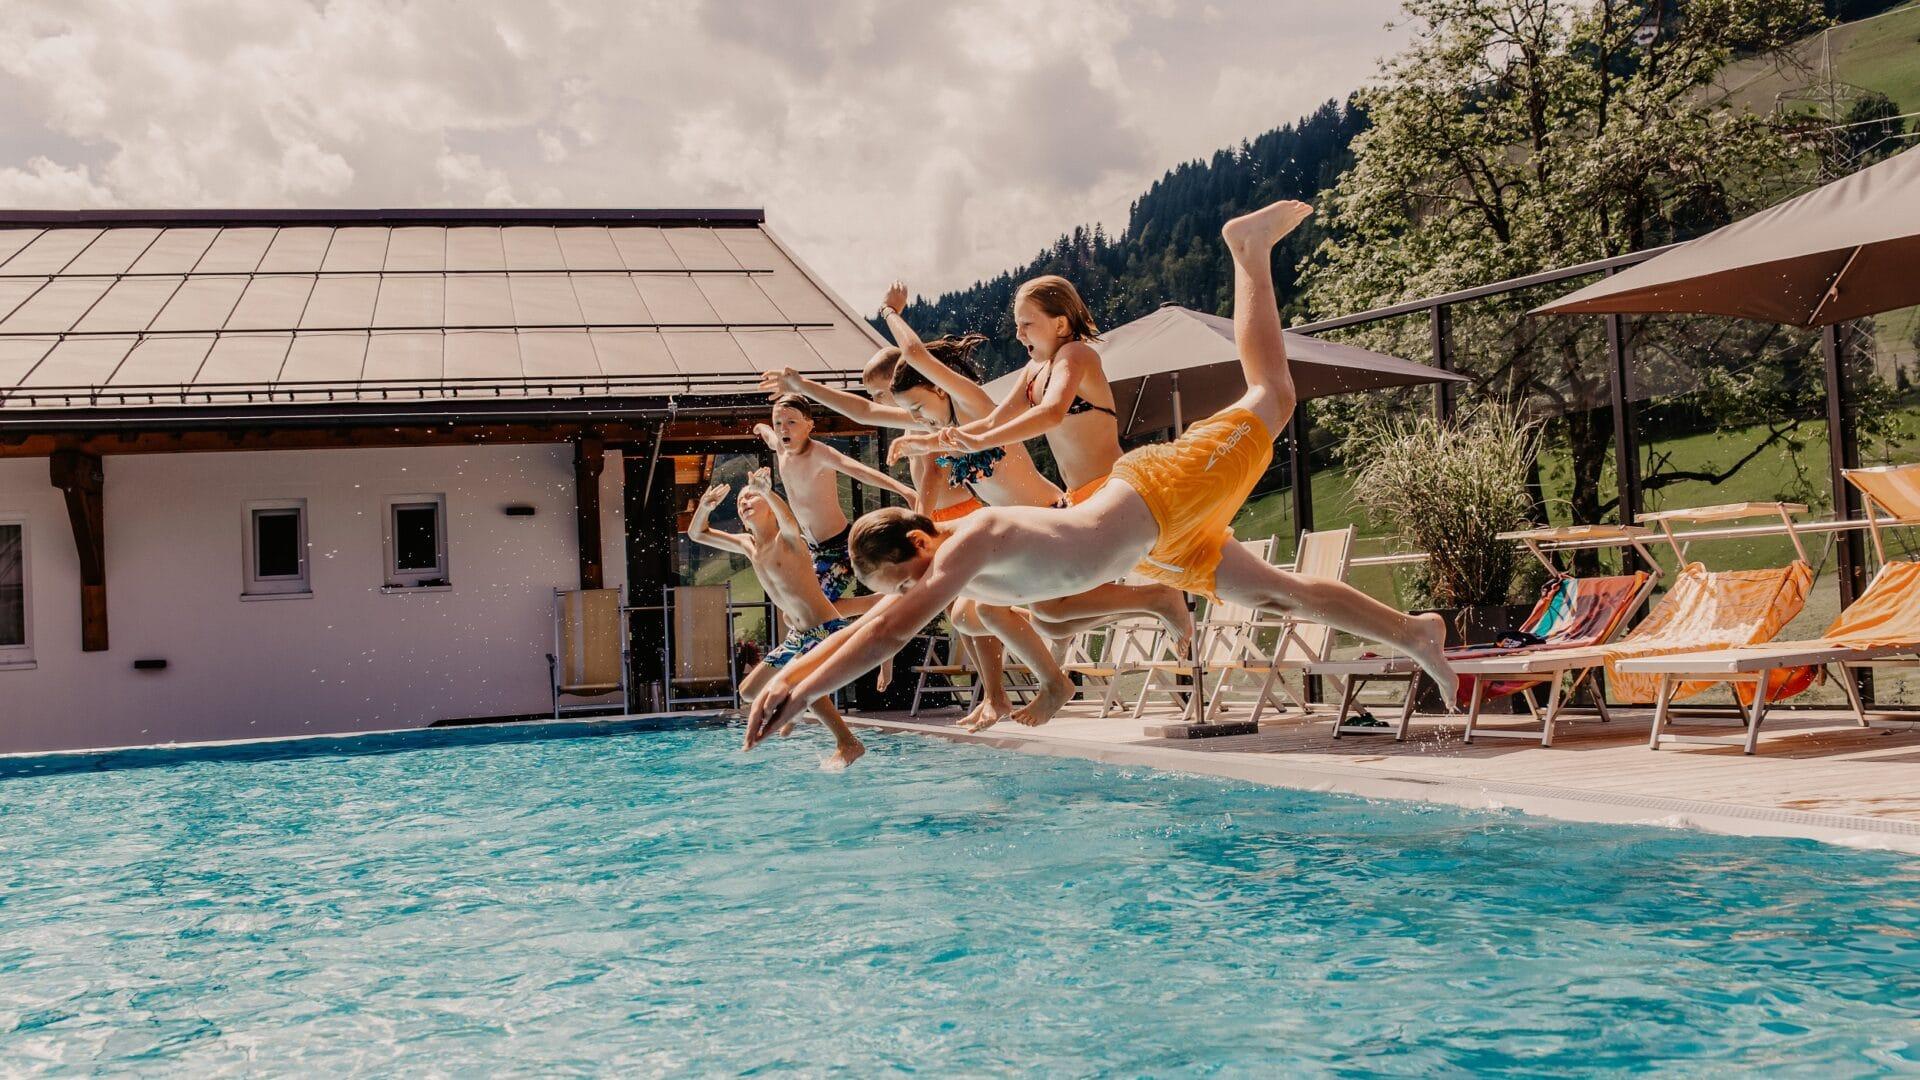 Hofgut-apartment-&-lifestyle-resort-wagrain-familienurlaub-winter-snowspace-Wagraini.j